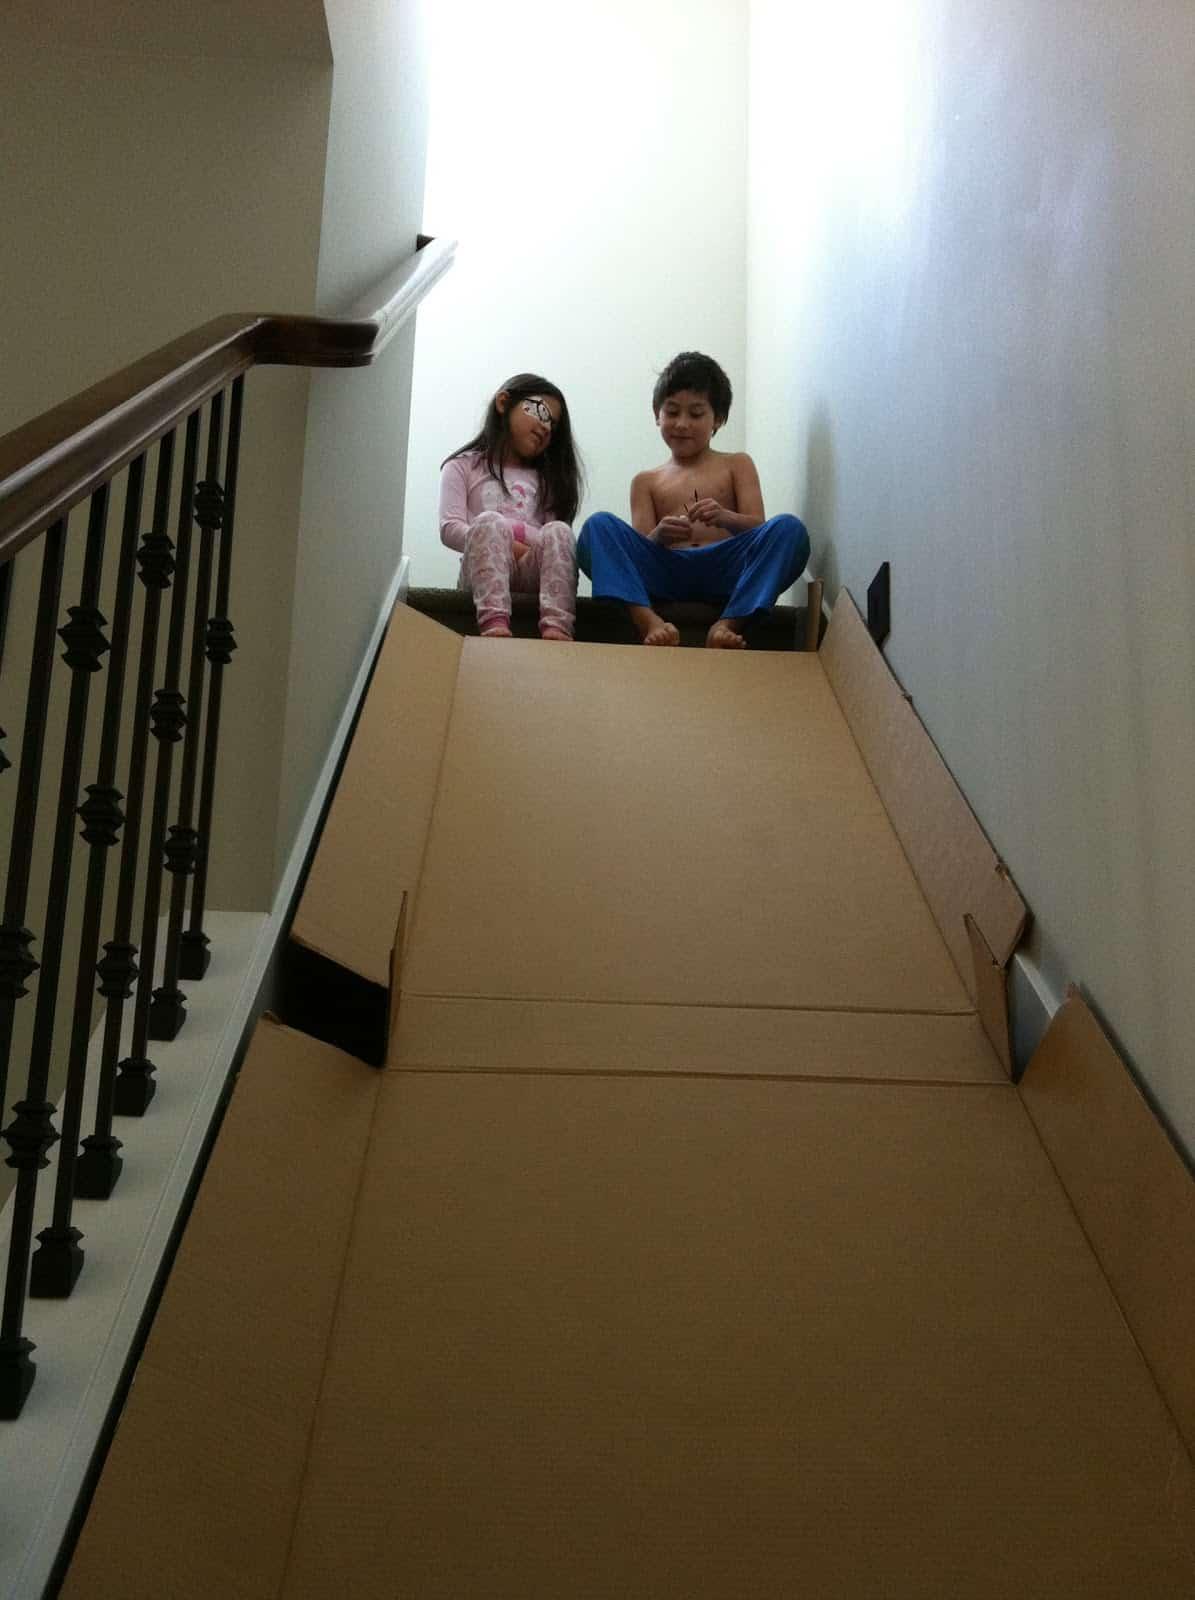 Cardboard staircase slide